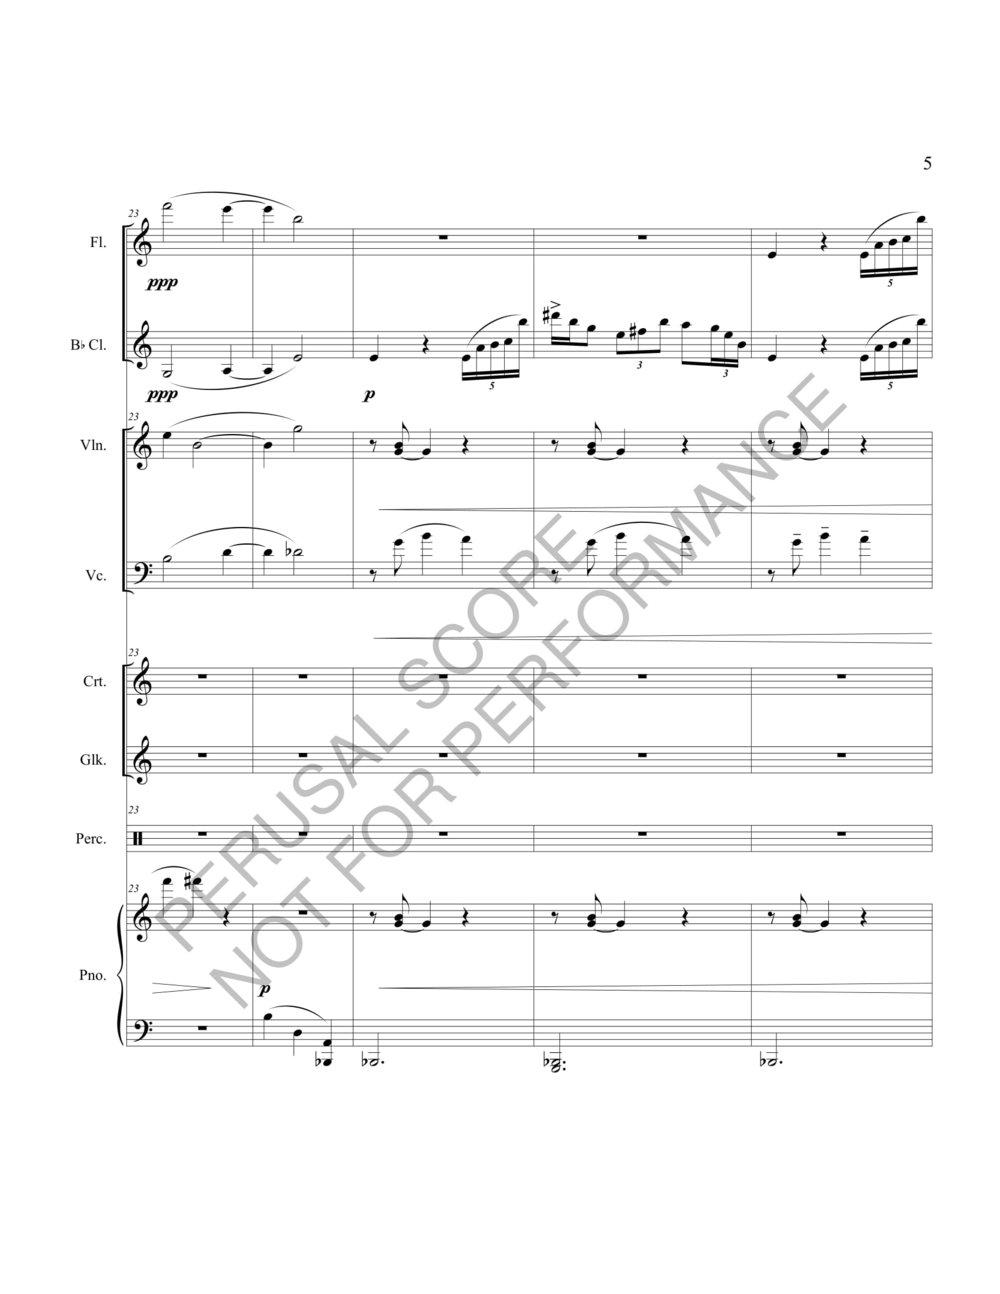 Boyd Terra Liberi Score-watermark-11.jpg